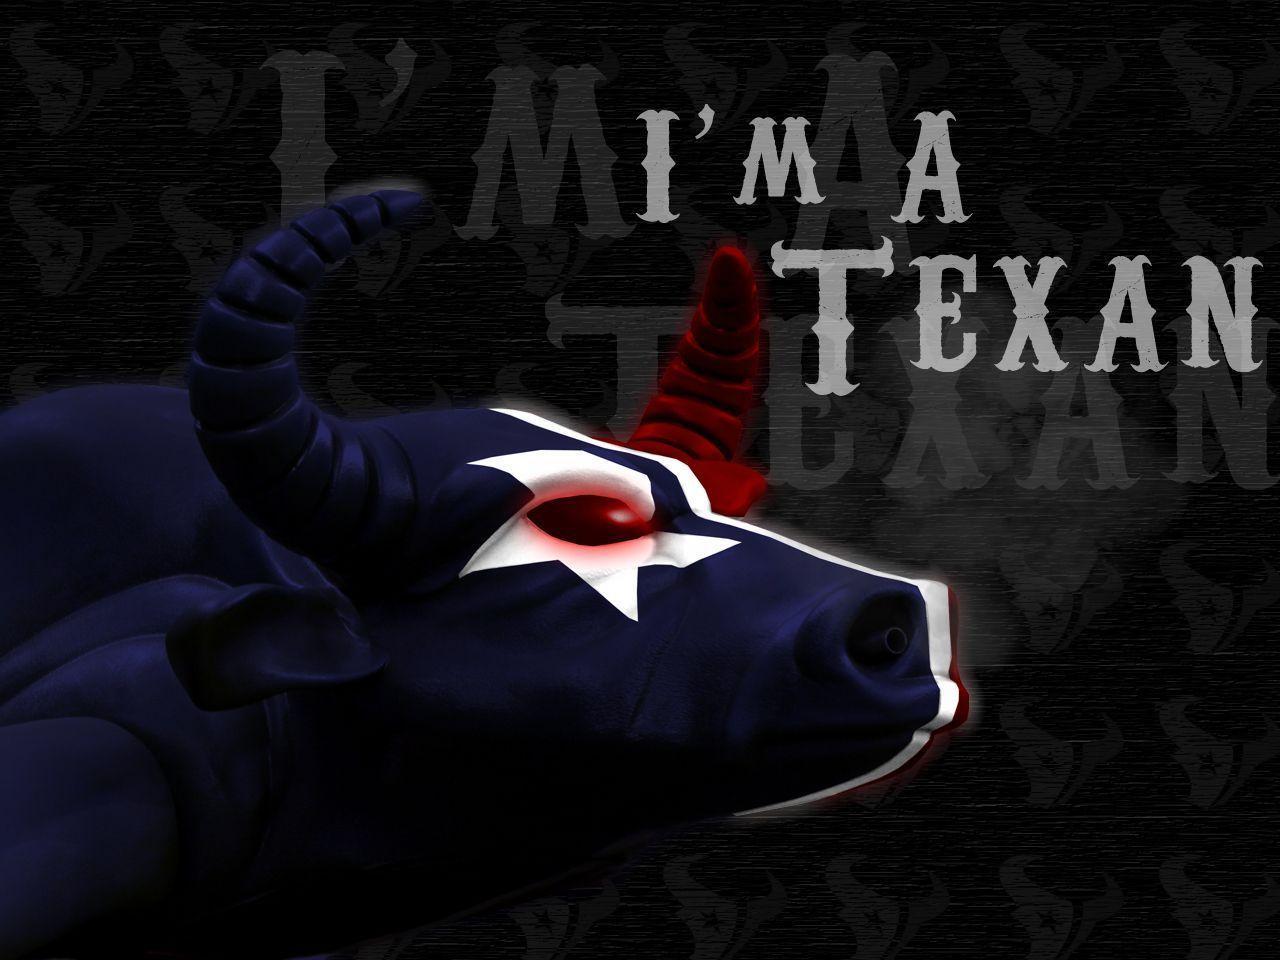 Houston Texans Wallpapers 2016 1280x960